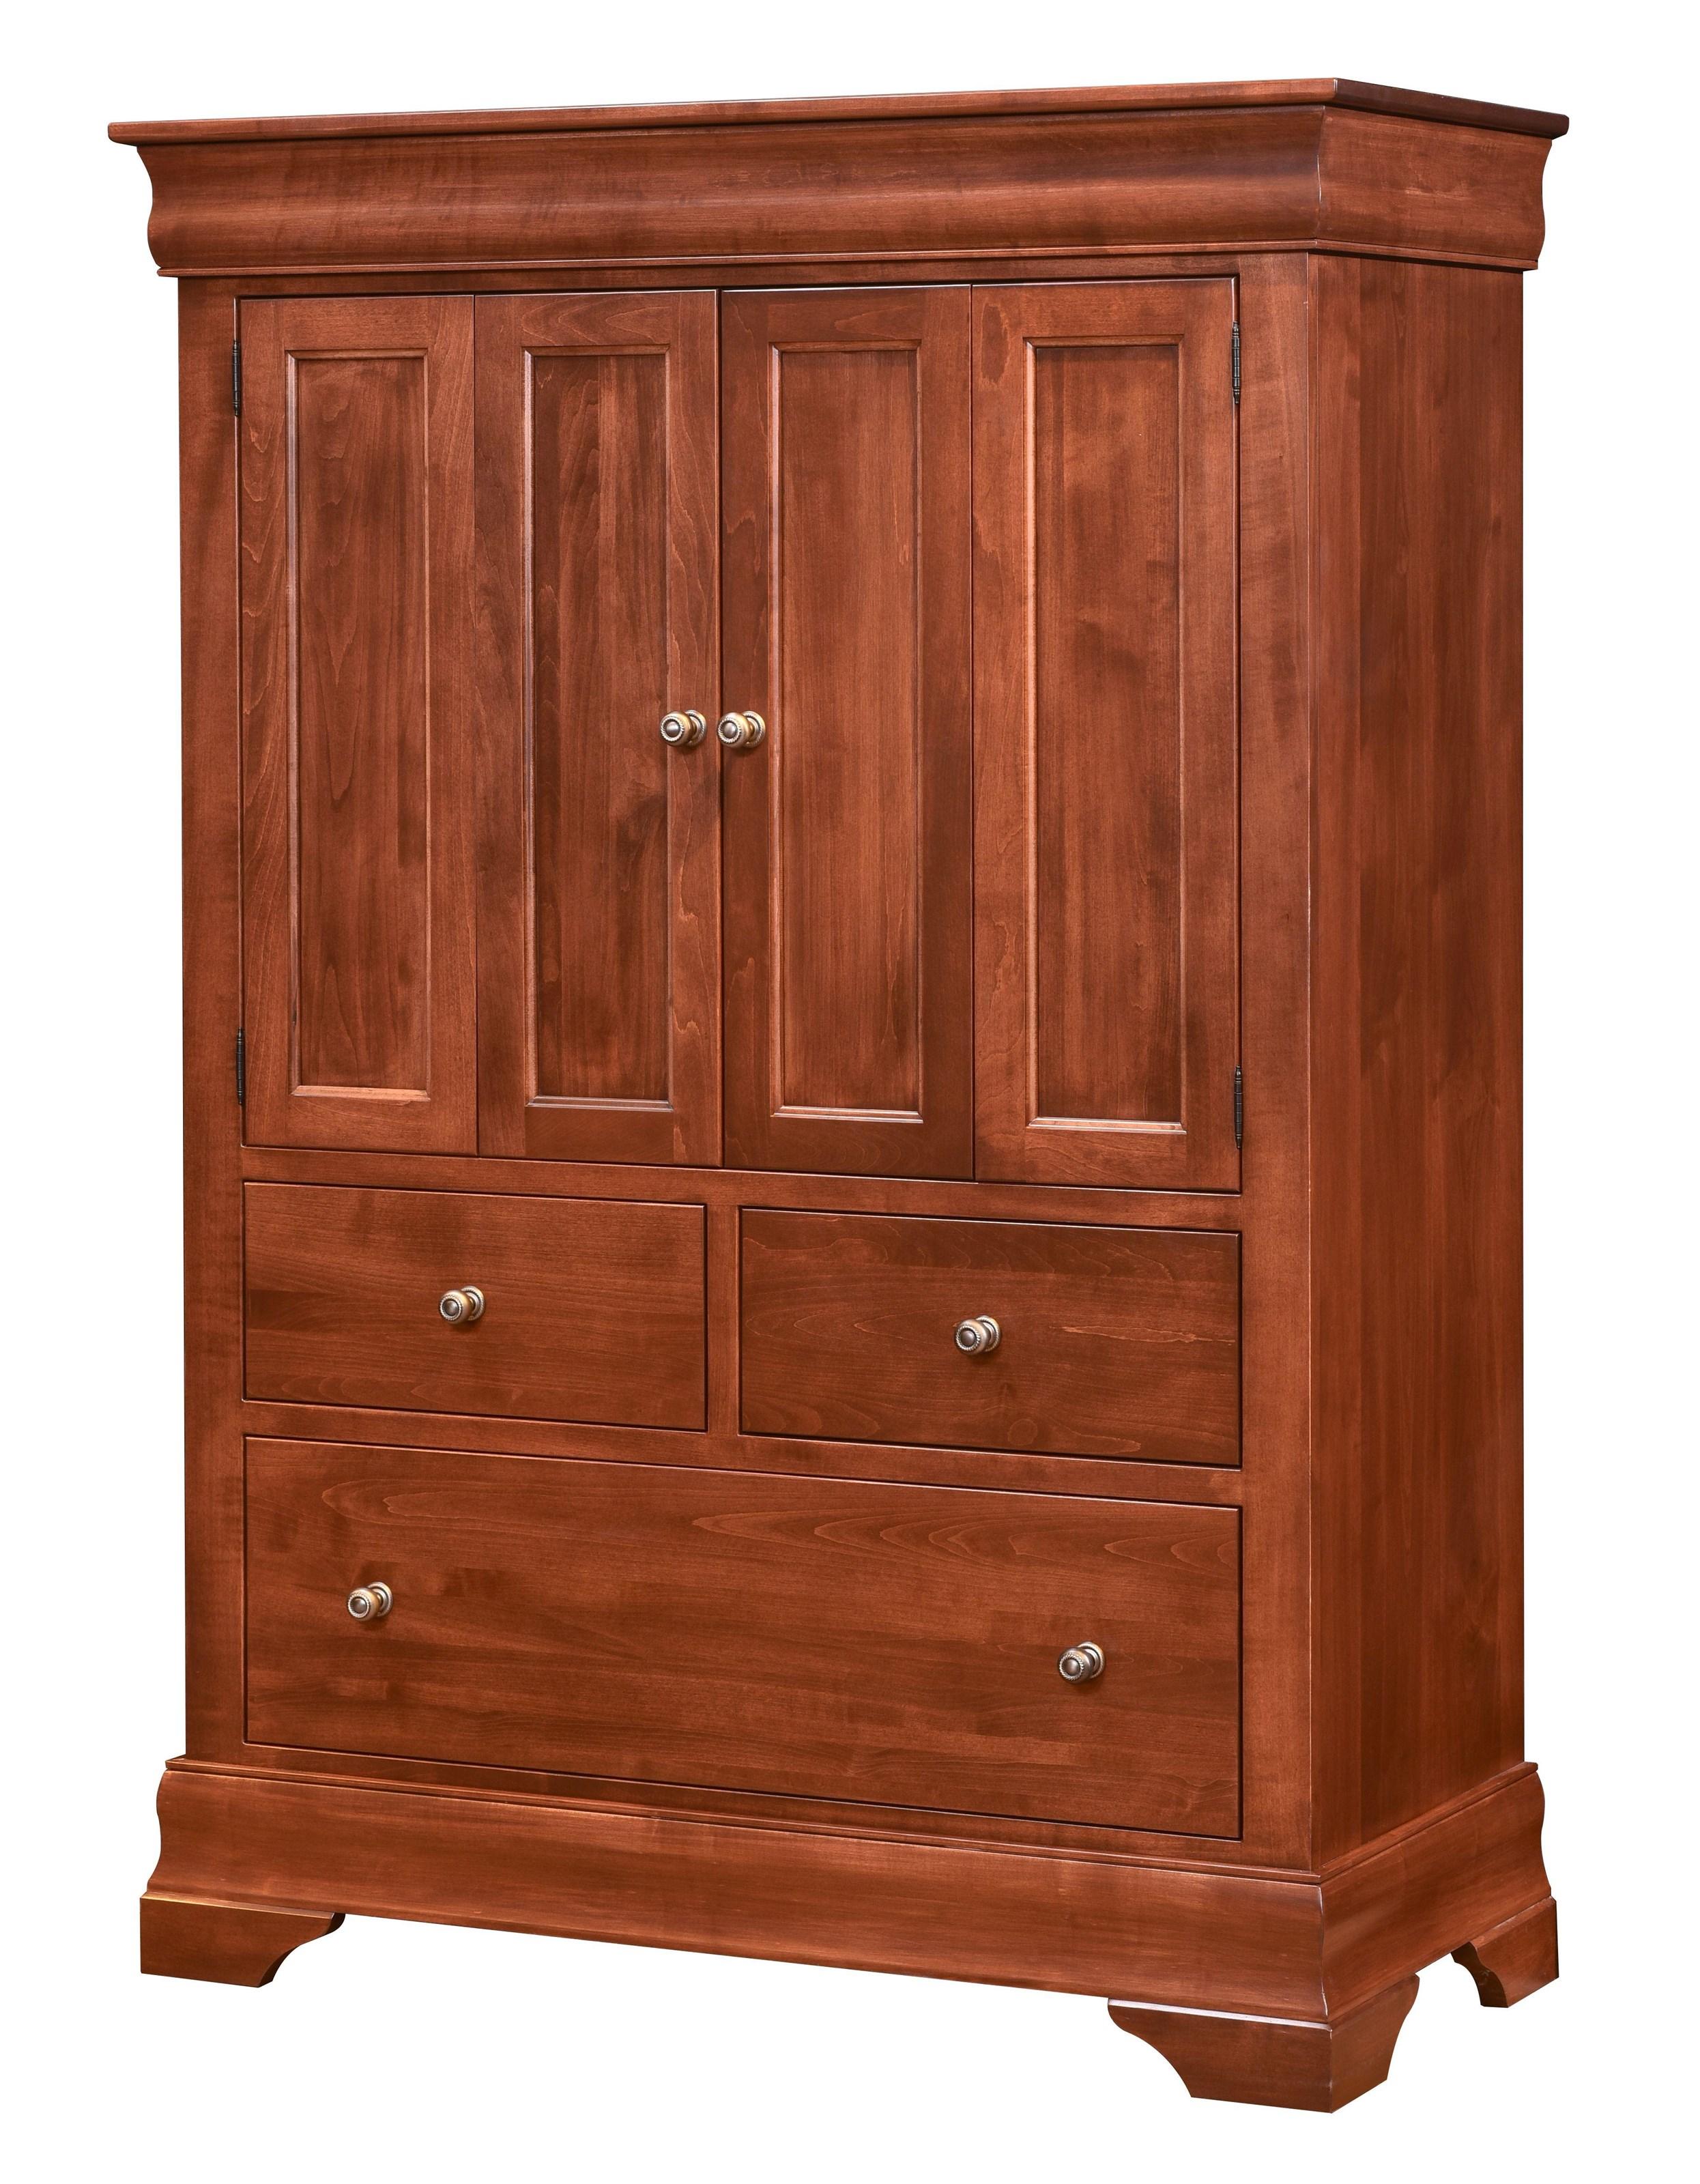 Wayside custom furniture chateau armoire 2 door 3 drawers for Wayside furniture